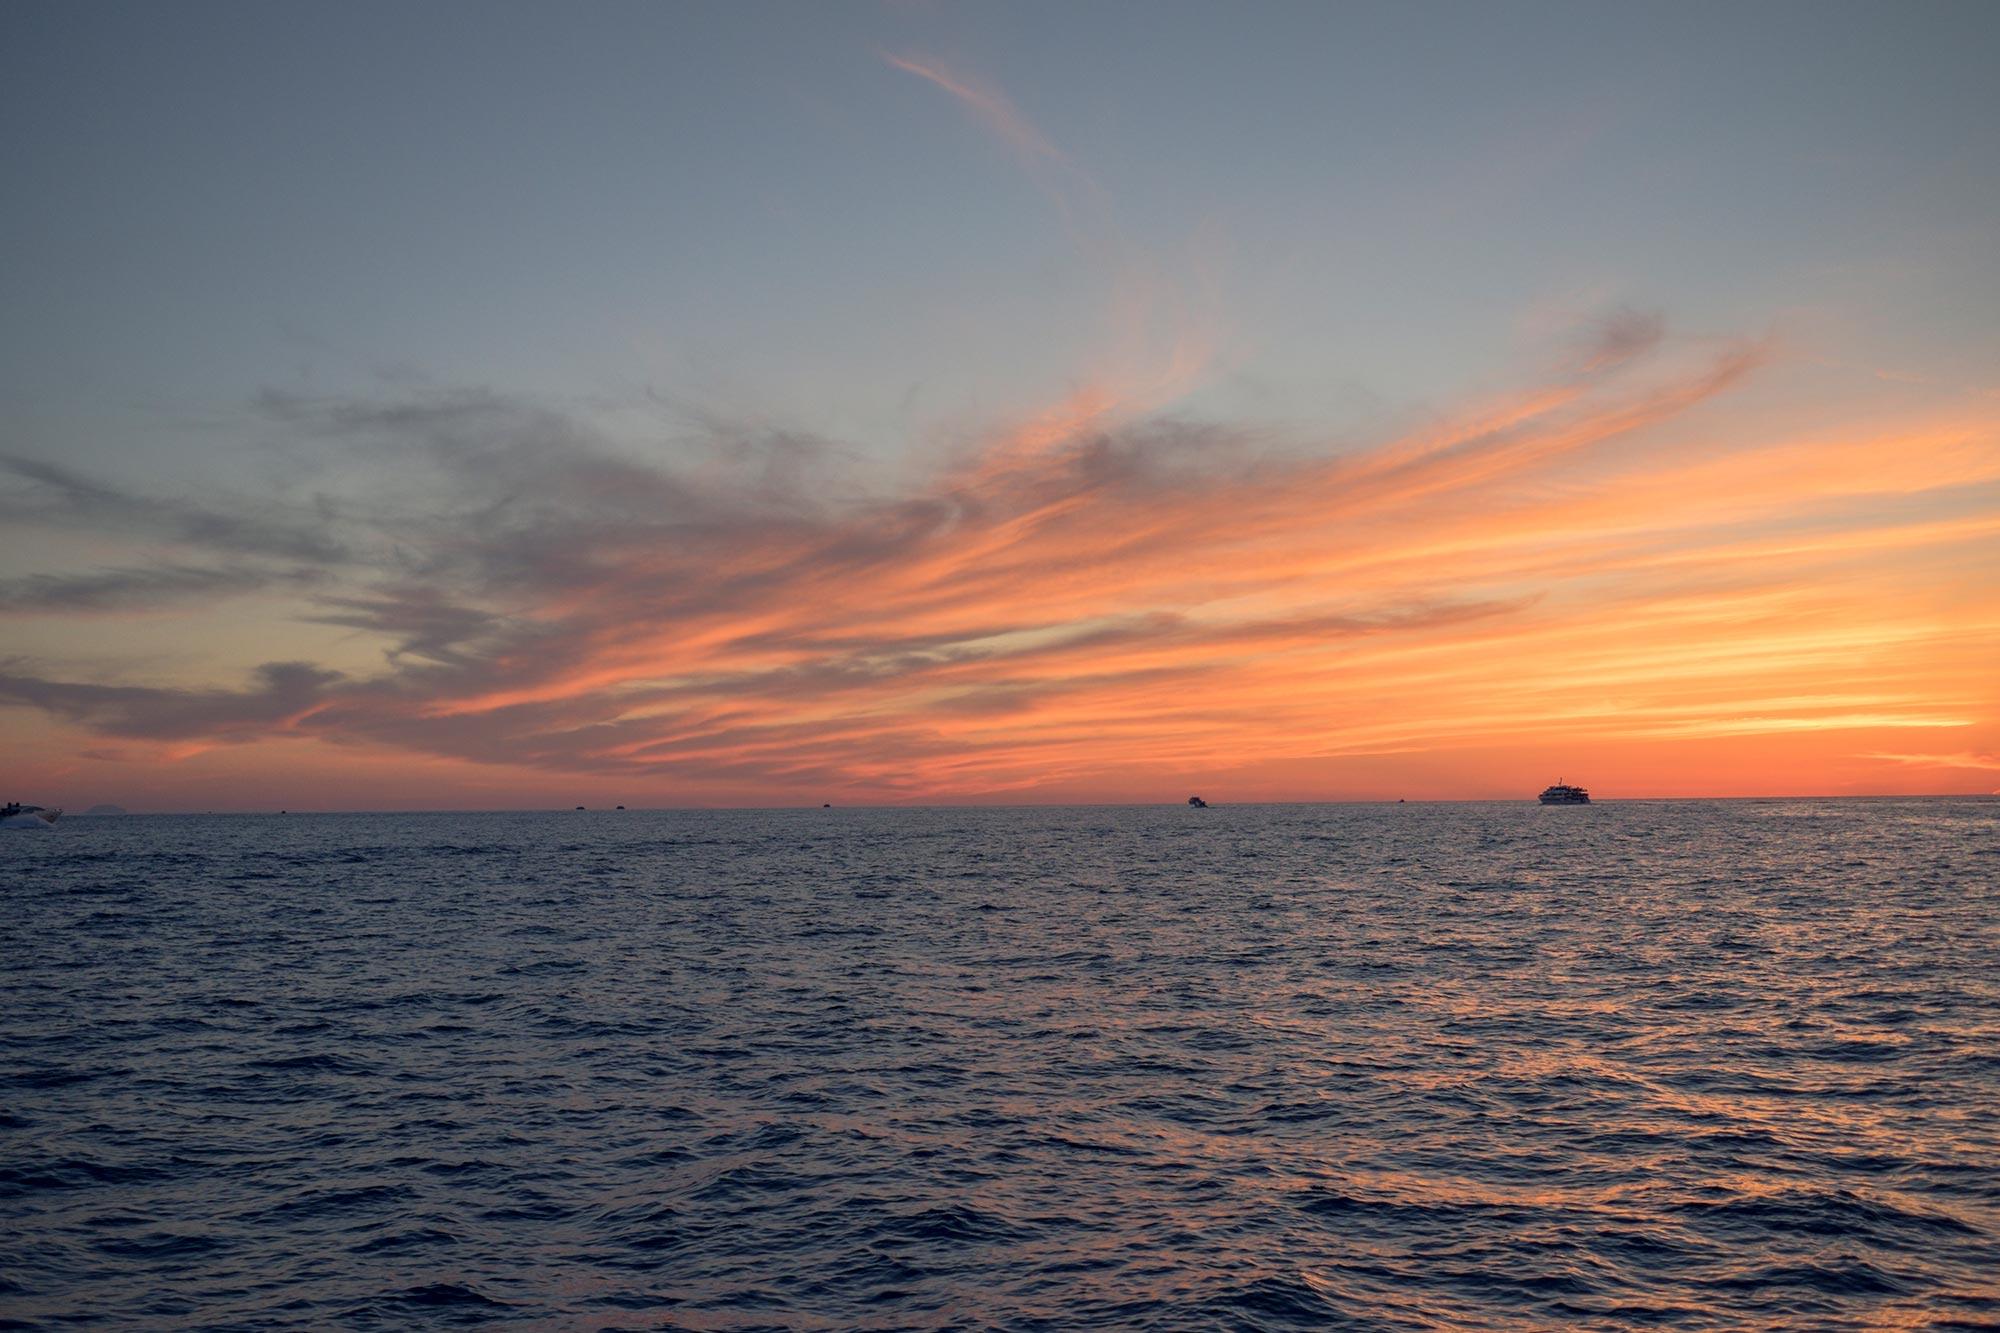 italy-sicilia-eolie-stromboli-sunset-sea